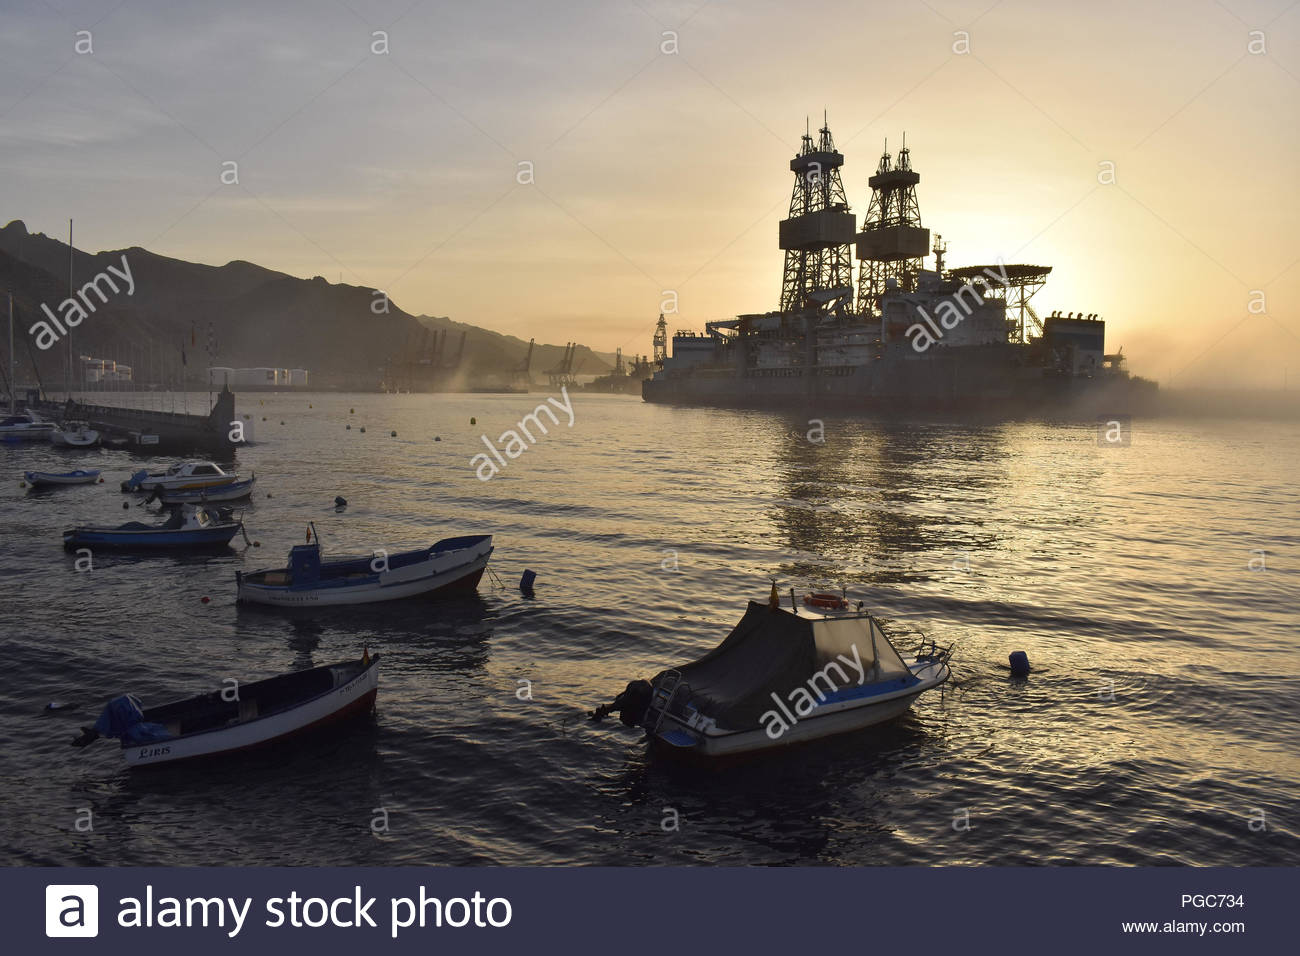 Drillship (oil rig platform) in morning fog. Santa Cruz de Tenerife harbor, Tenerife Canary Islands Spain. Stock Photo